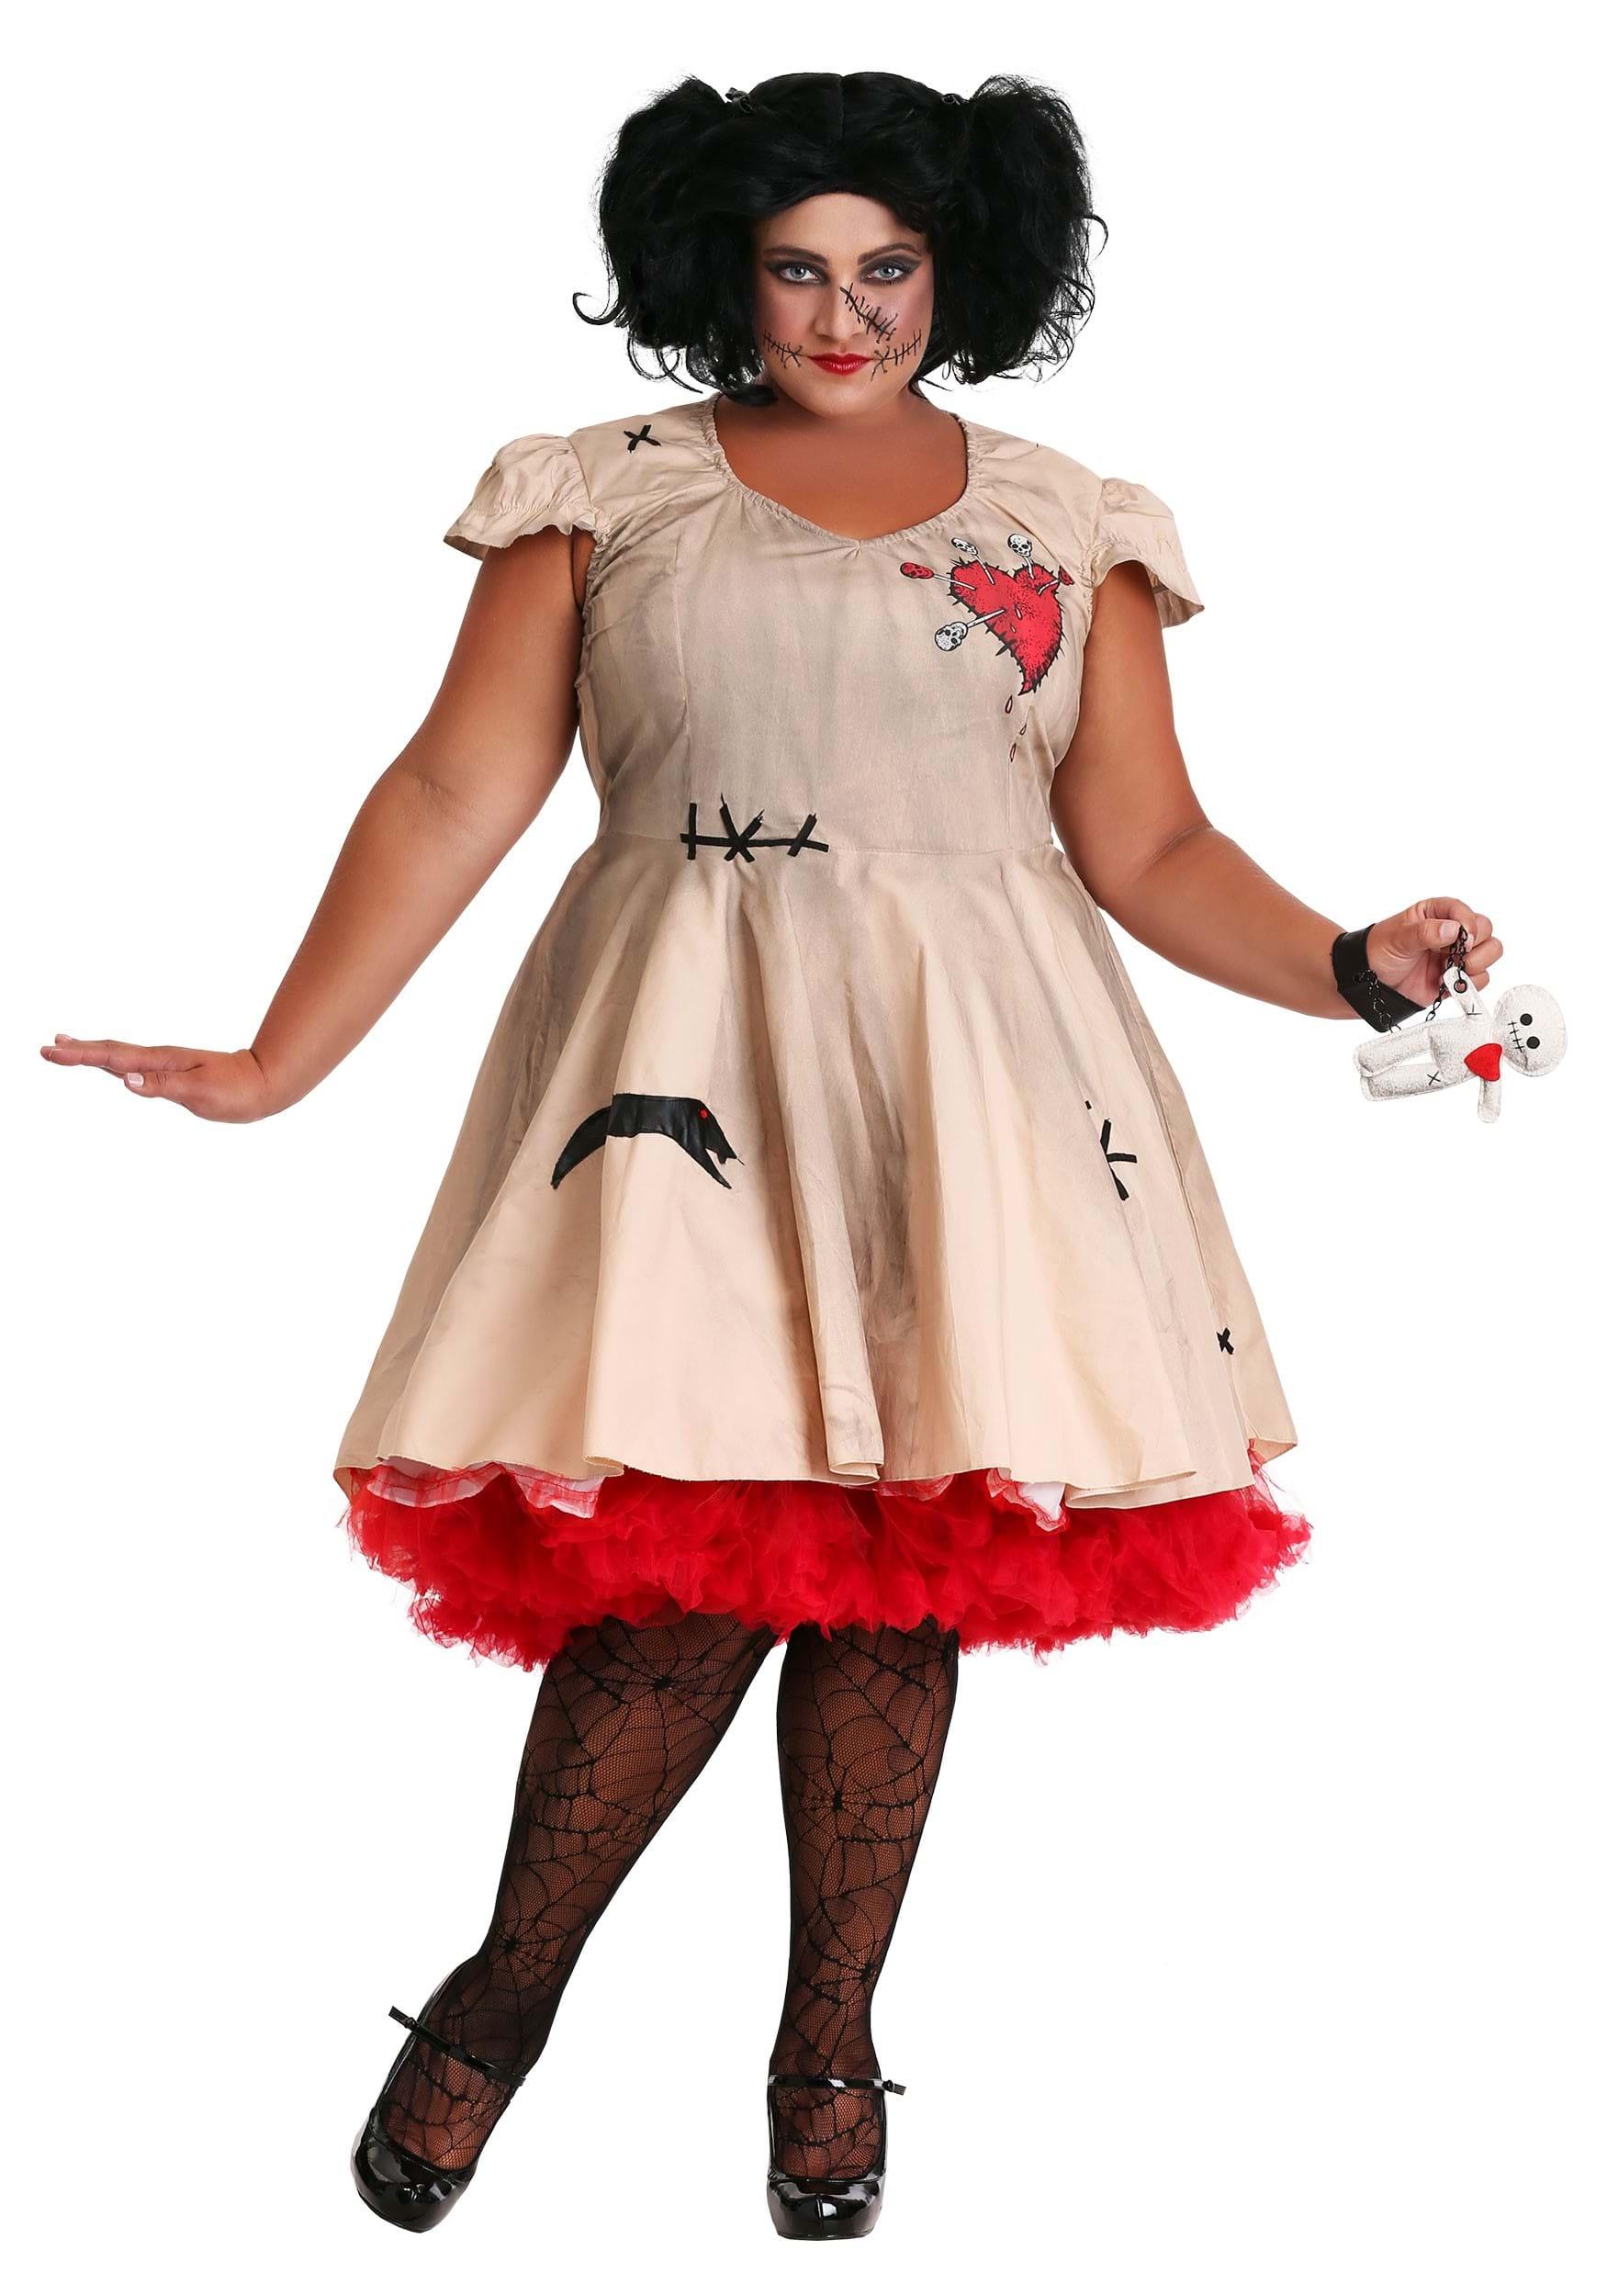 754352bcb8e78 Plus Size Voodoo Doll Costume for Women